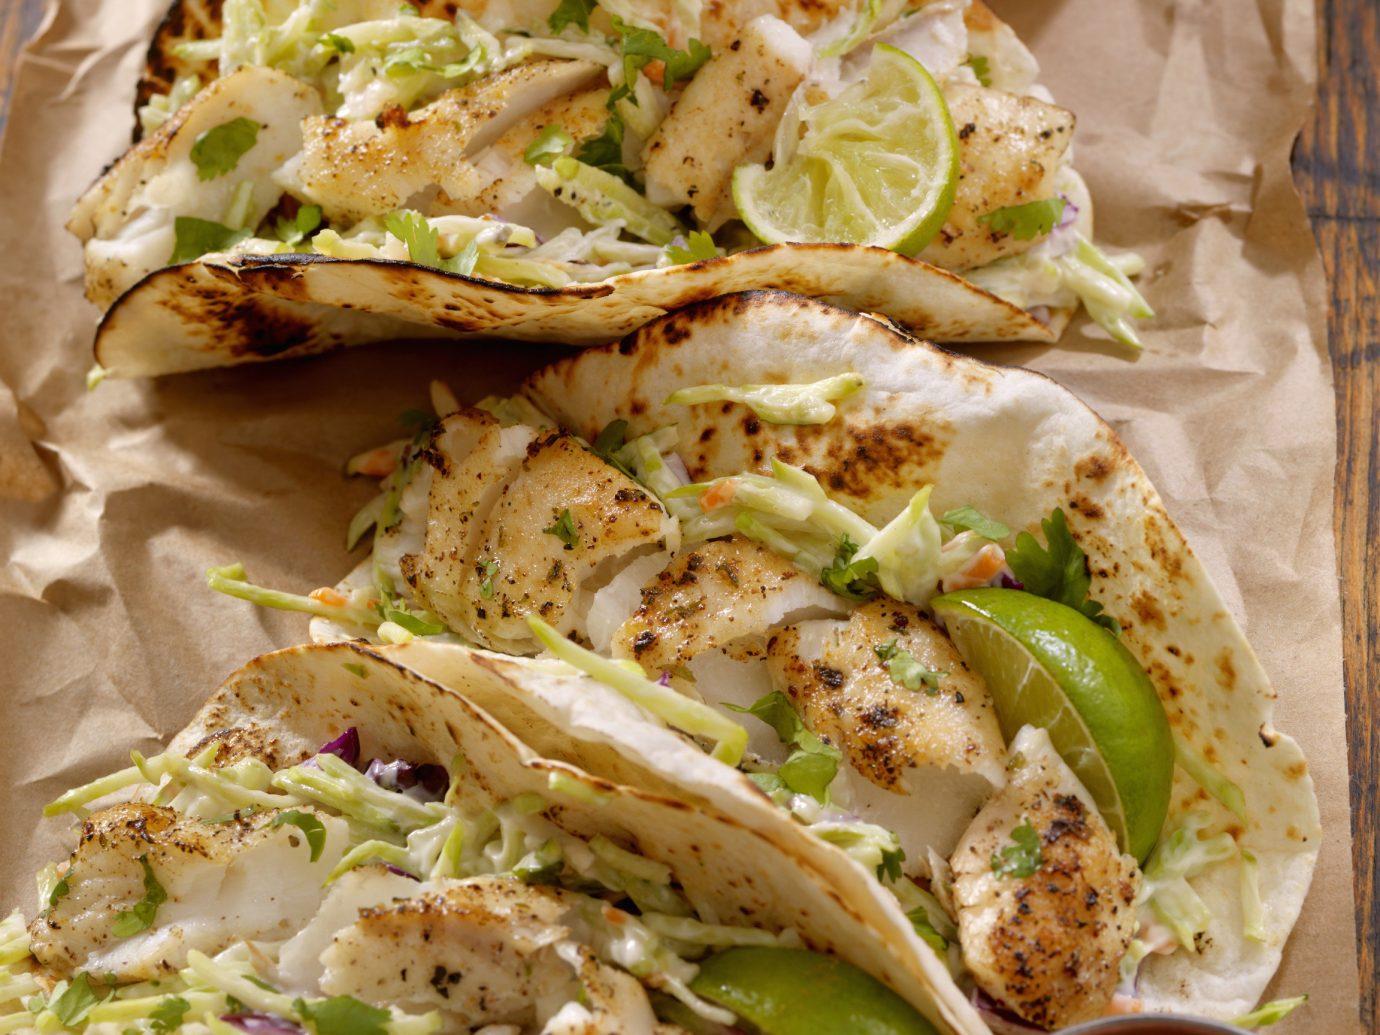 Trip Ideas food dish salad caesar salad produce cuisine meal taco vegetable lunch snack food meat